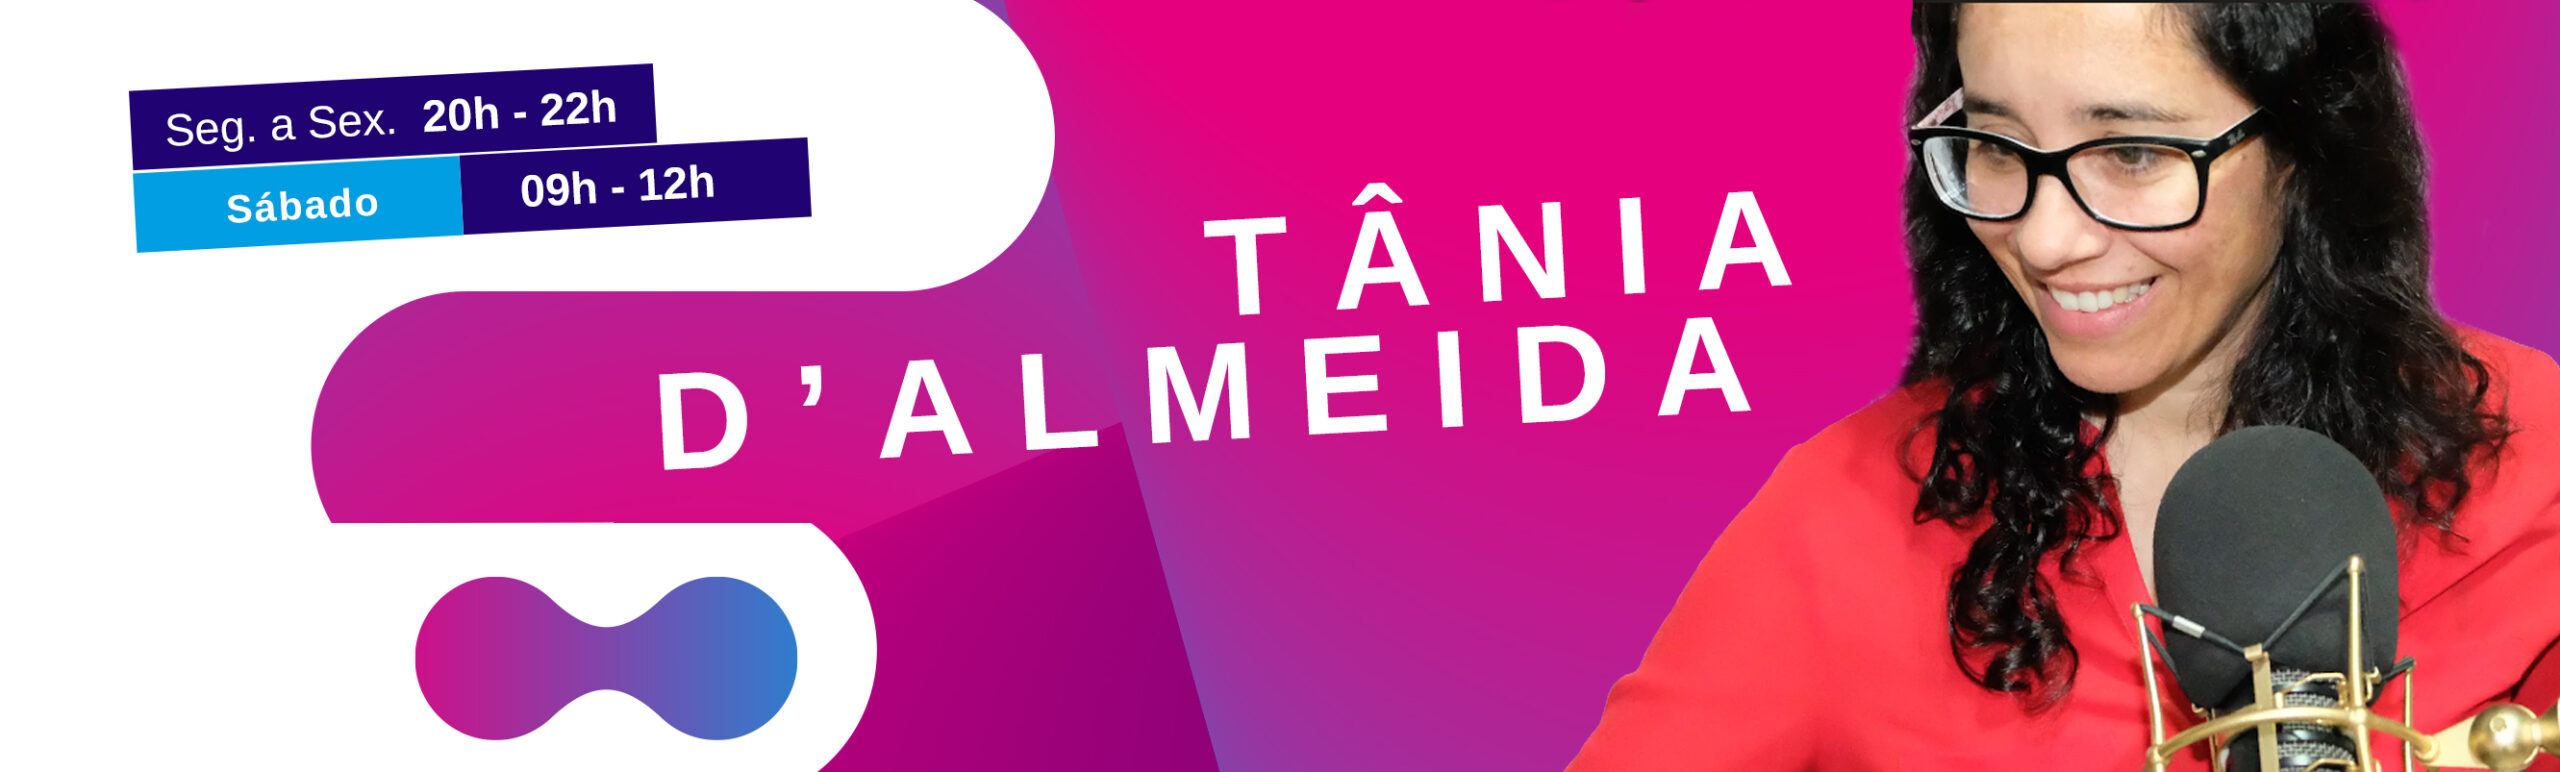 tania_v3-scaled